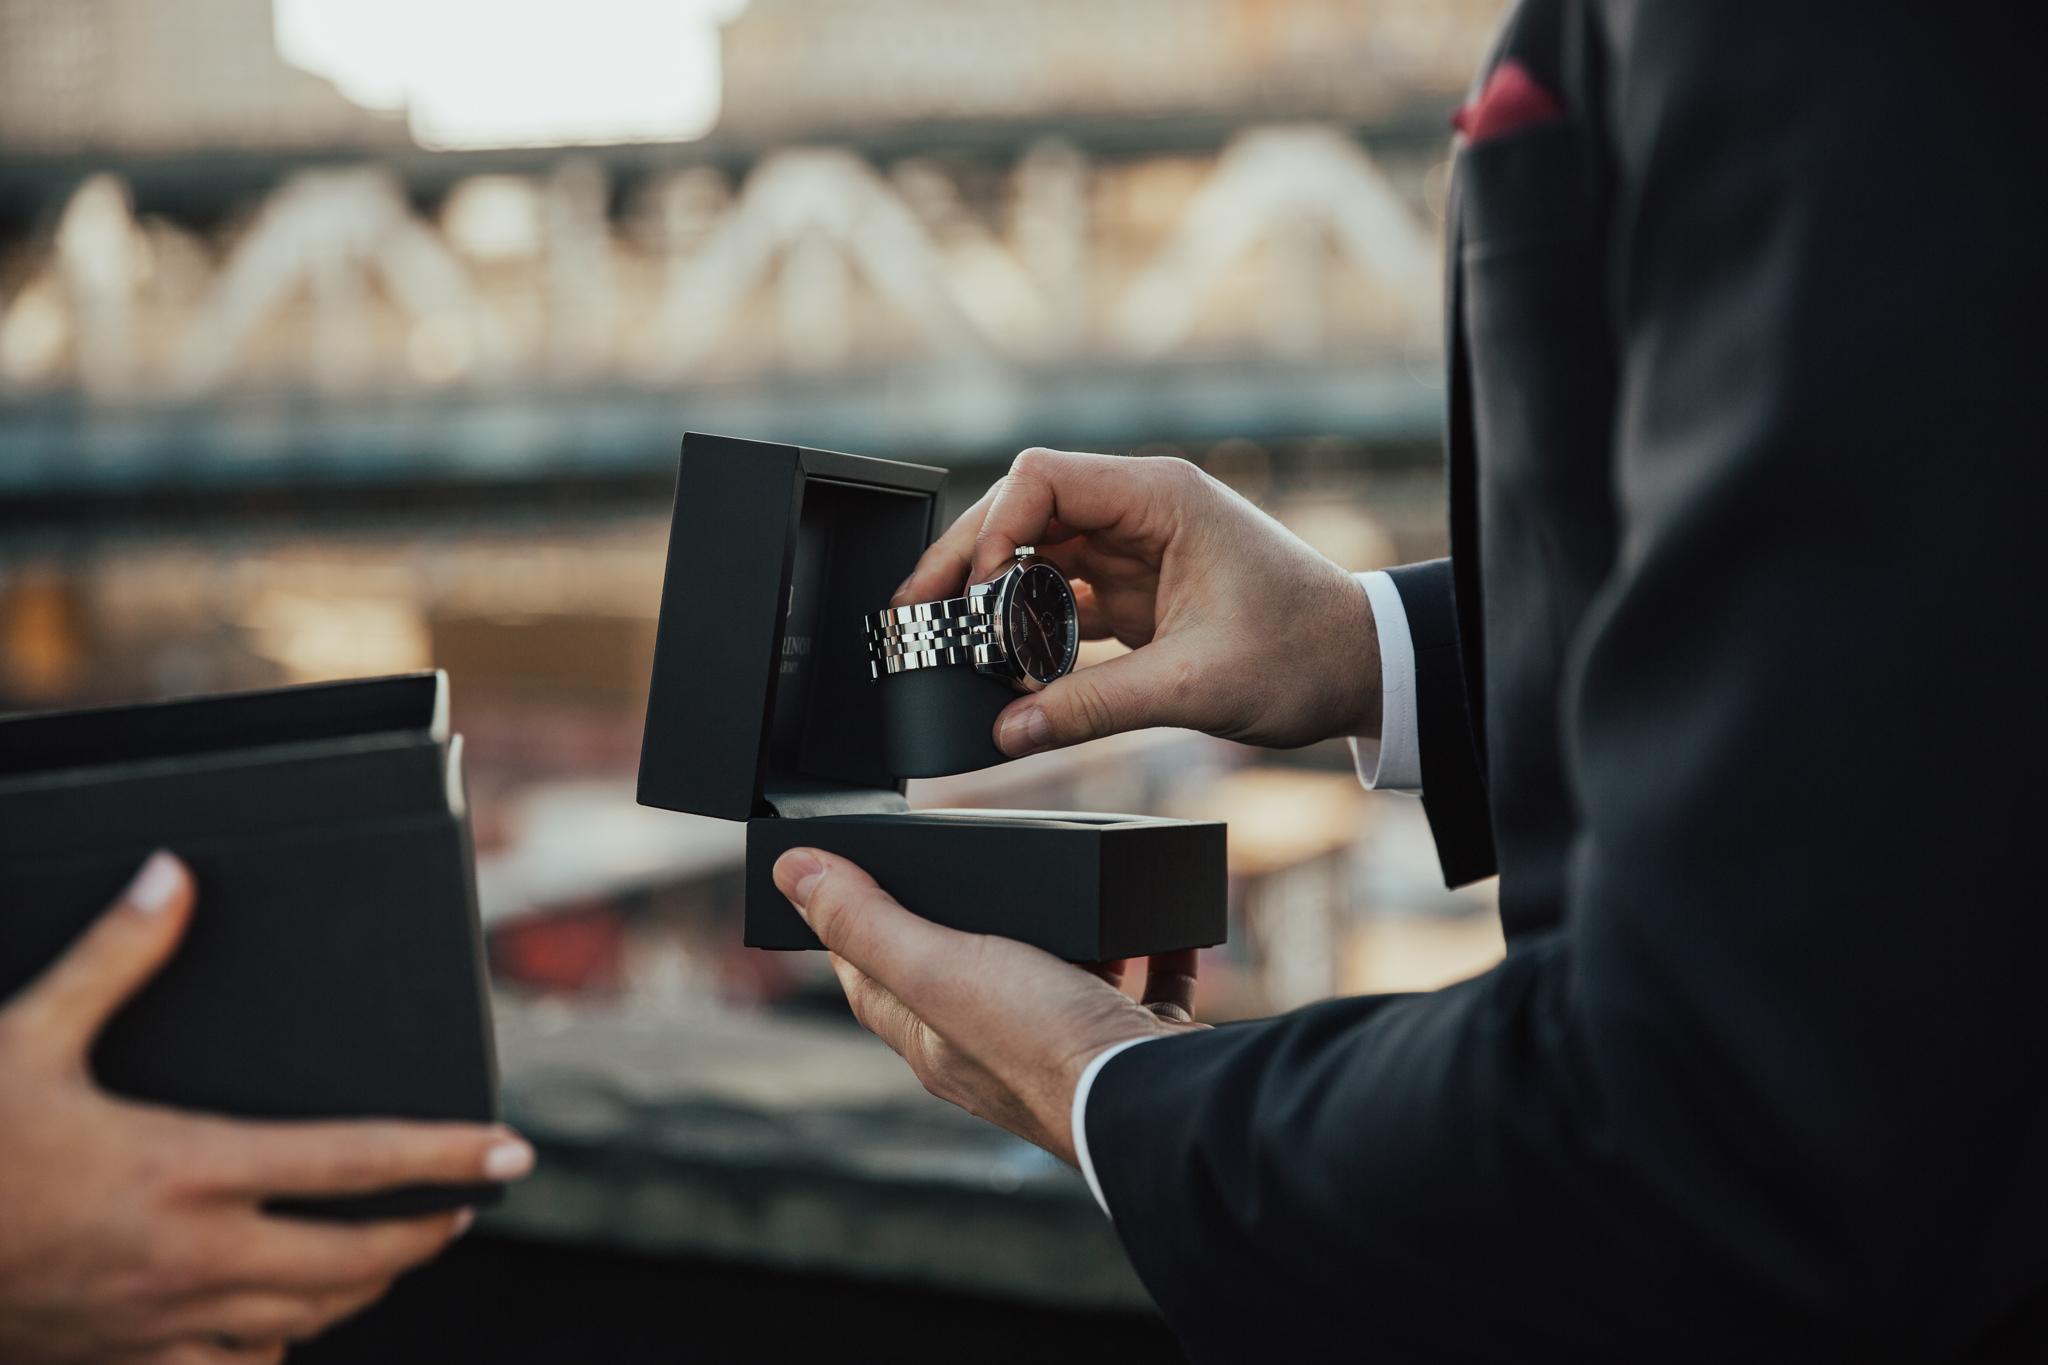 watch groom gift